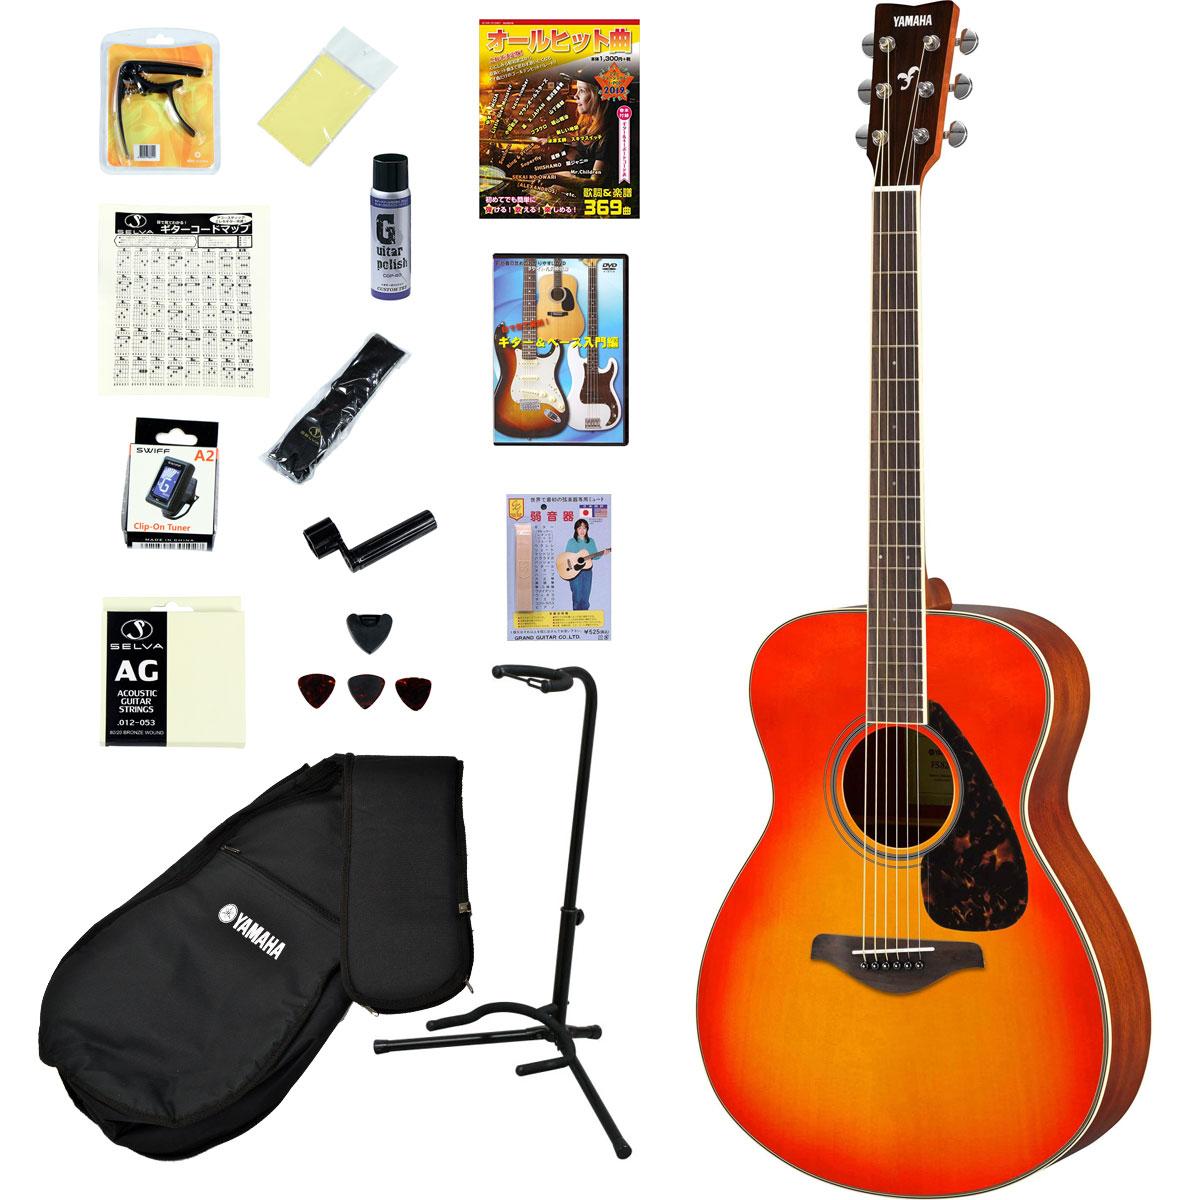 YAMAHA / FS820 AB(オータムバースト) 【オールヒット曲歌本17点入門セット】【楽譜が付いたお買い得セット】 ヤマハ アコースティックギター アコギ FS-820 入門 初心者【YRK】